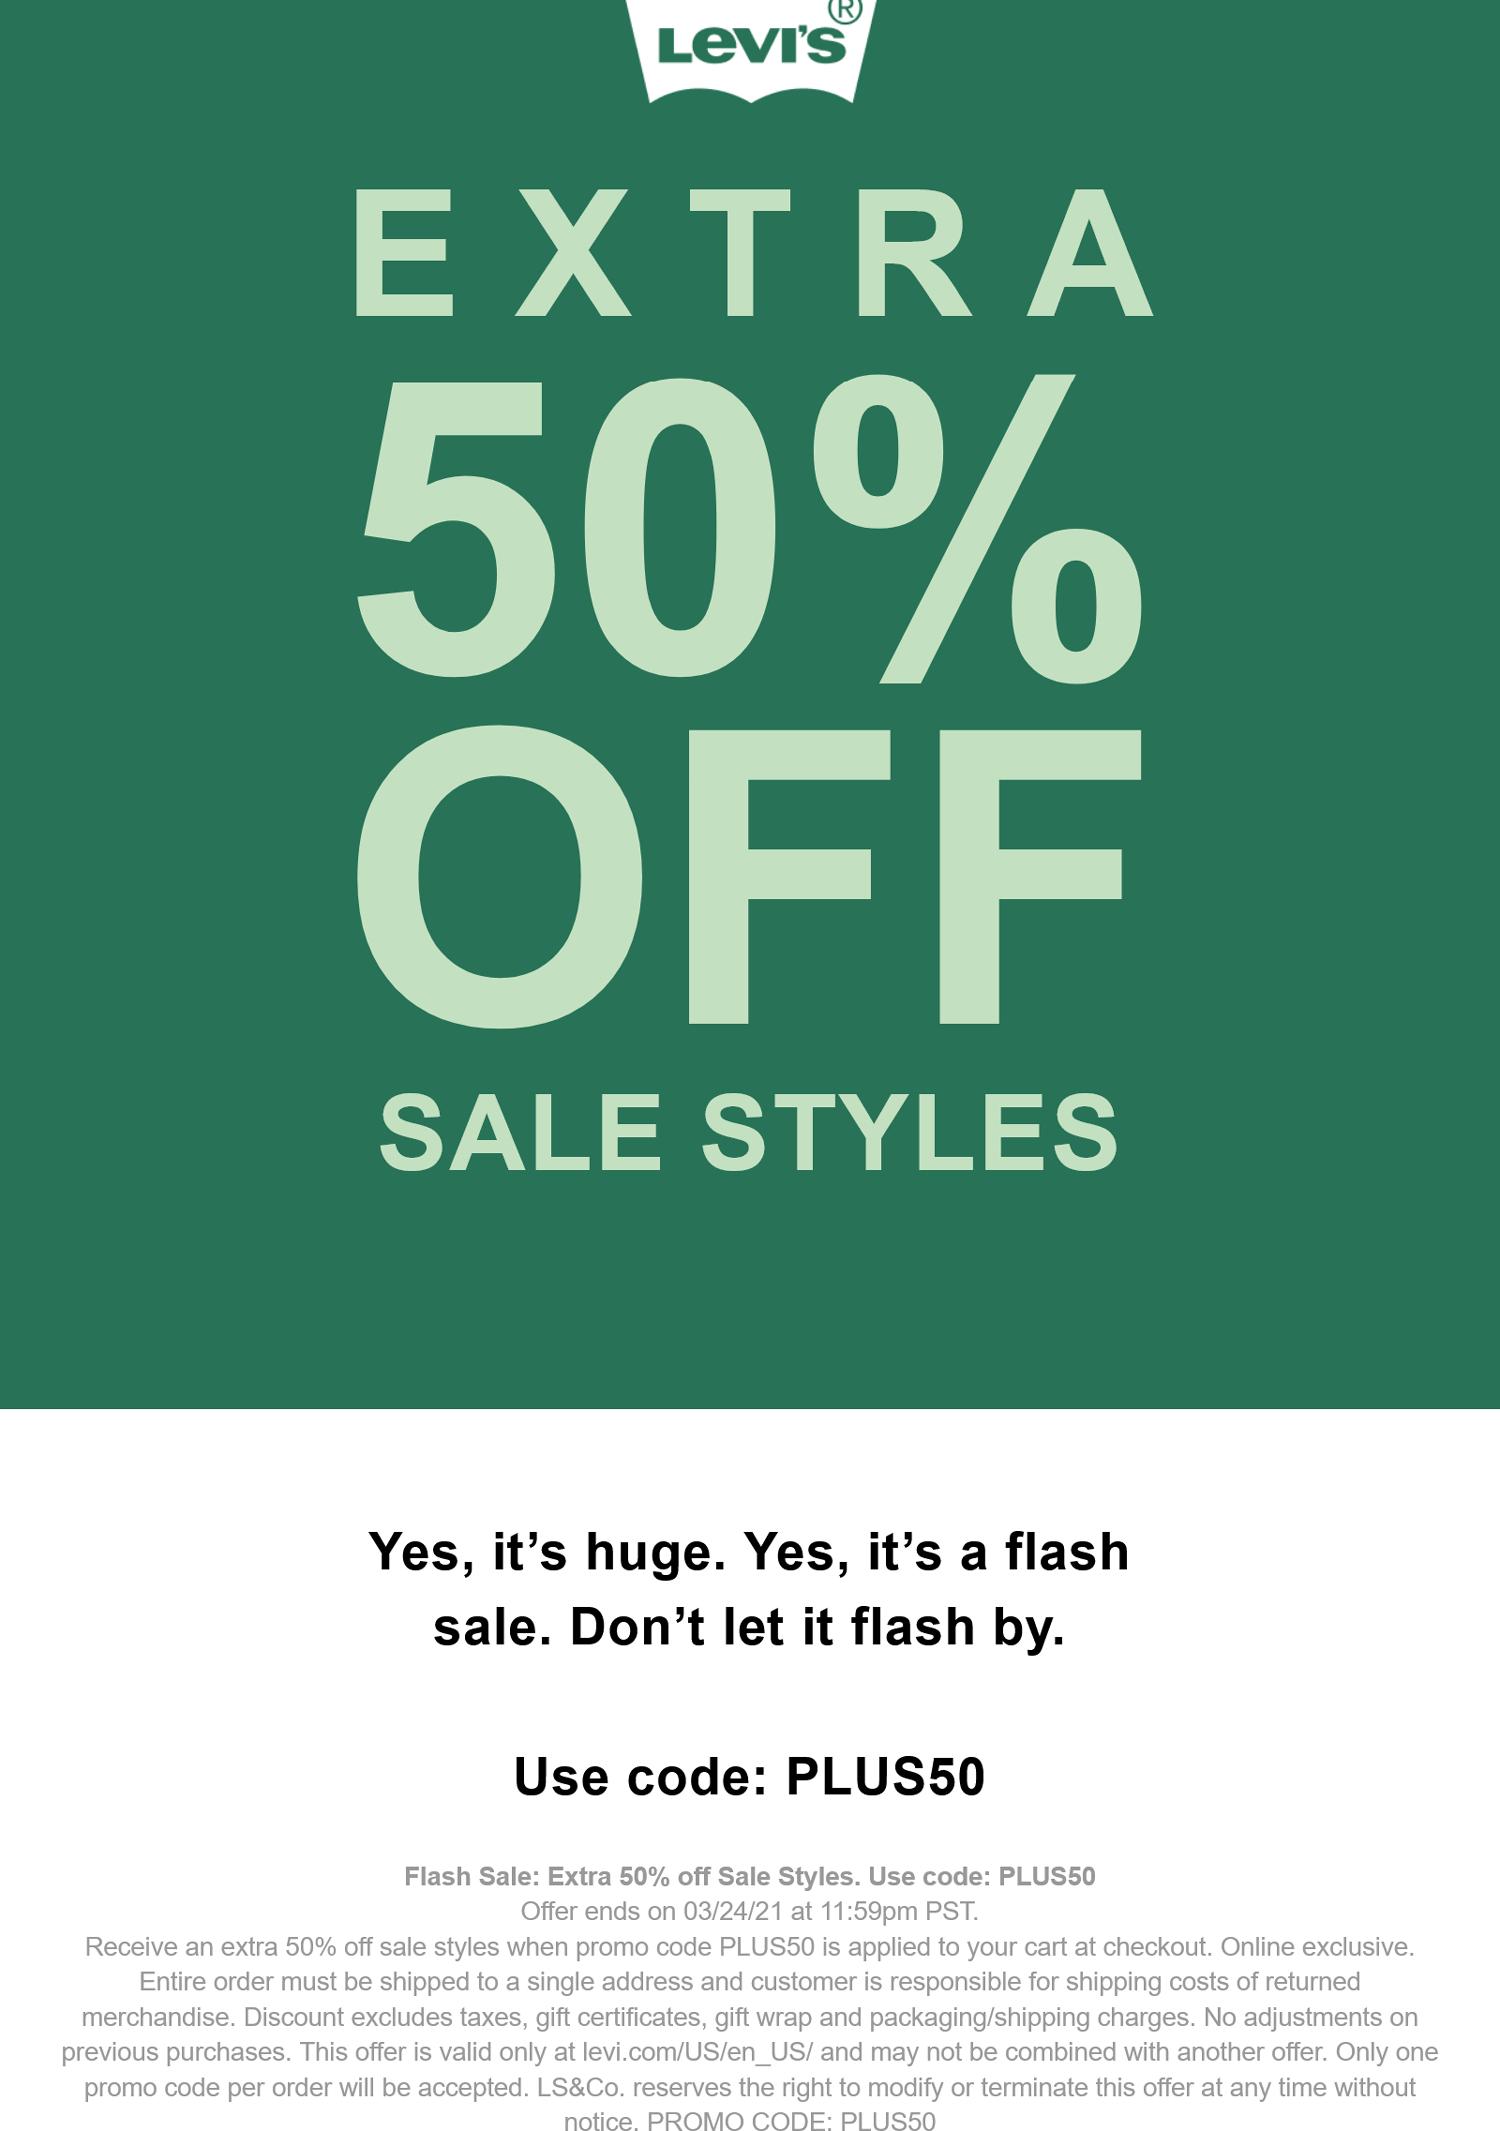 Levis stores Coupon  Extra 50% off sale styles at Levis via promo code PLUS50 #levis